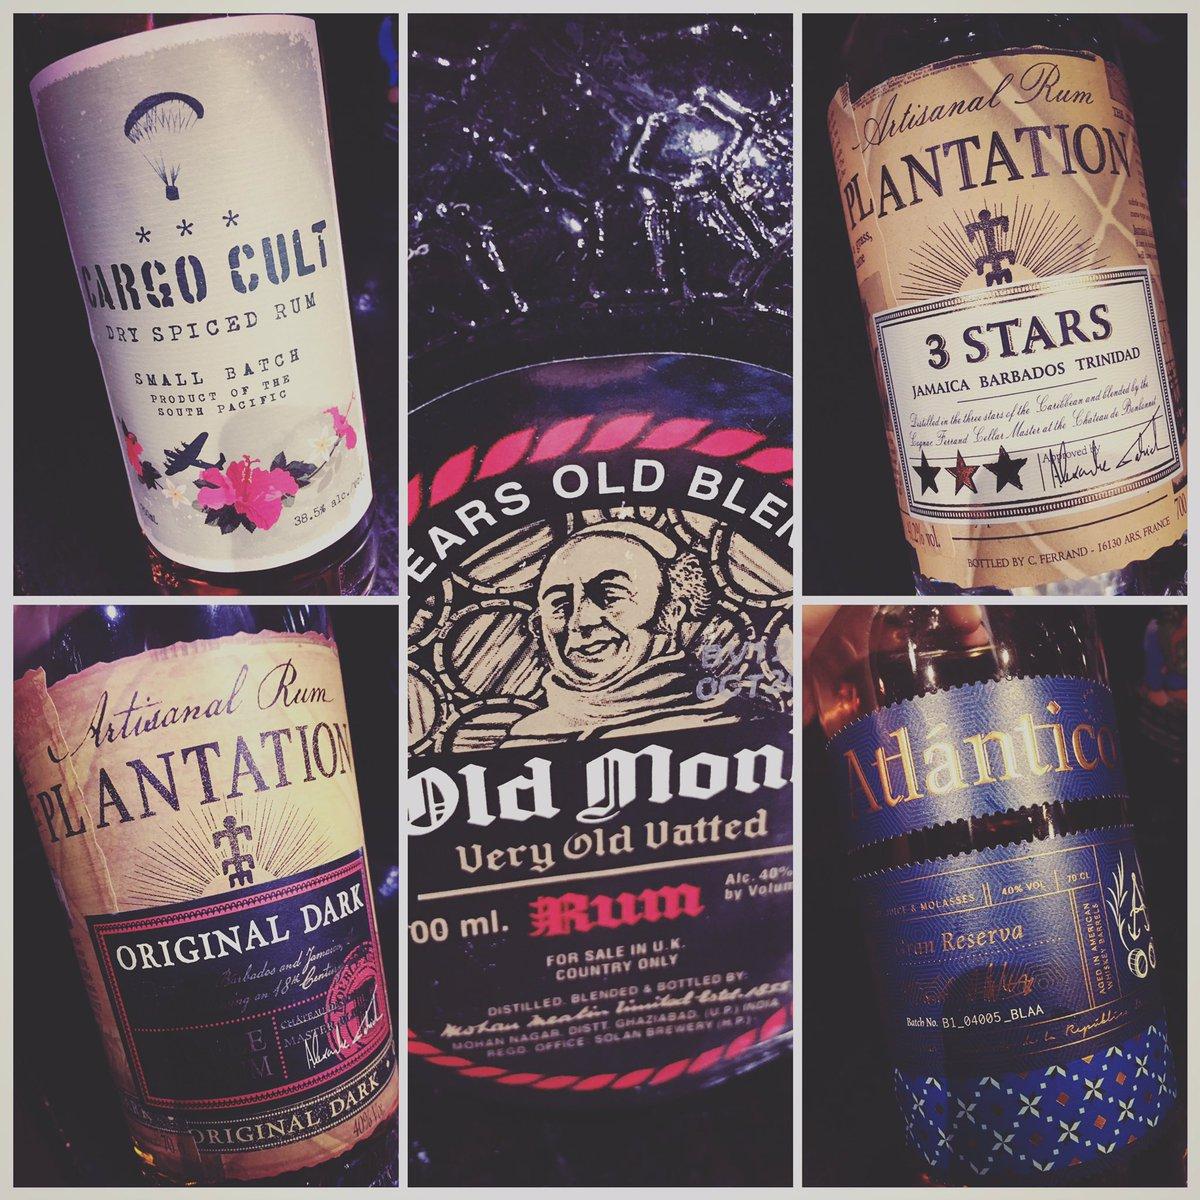 It's not all beer & gin! Check out our new range of rum. #oldmonk #plantationrum #cargocultrum #atlanticorum #artisanspirits #craftrum #rum #darkrum #whiterumpic.twitter.com/togV4GD68h